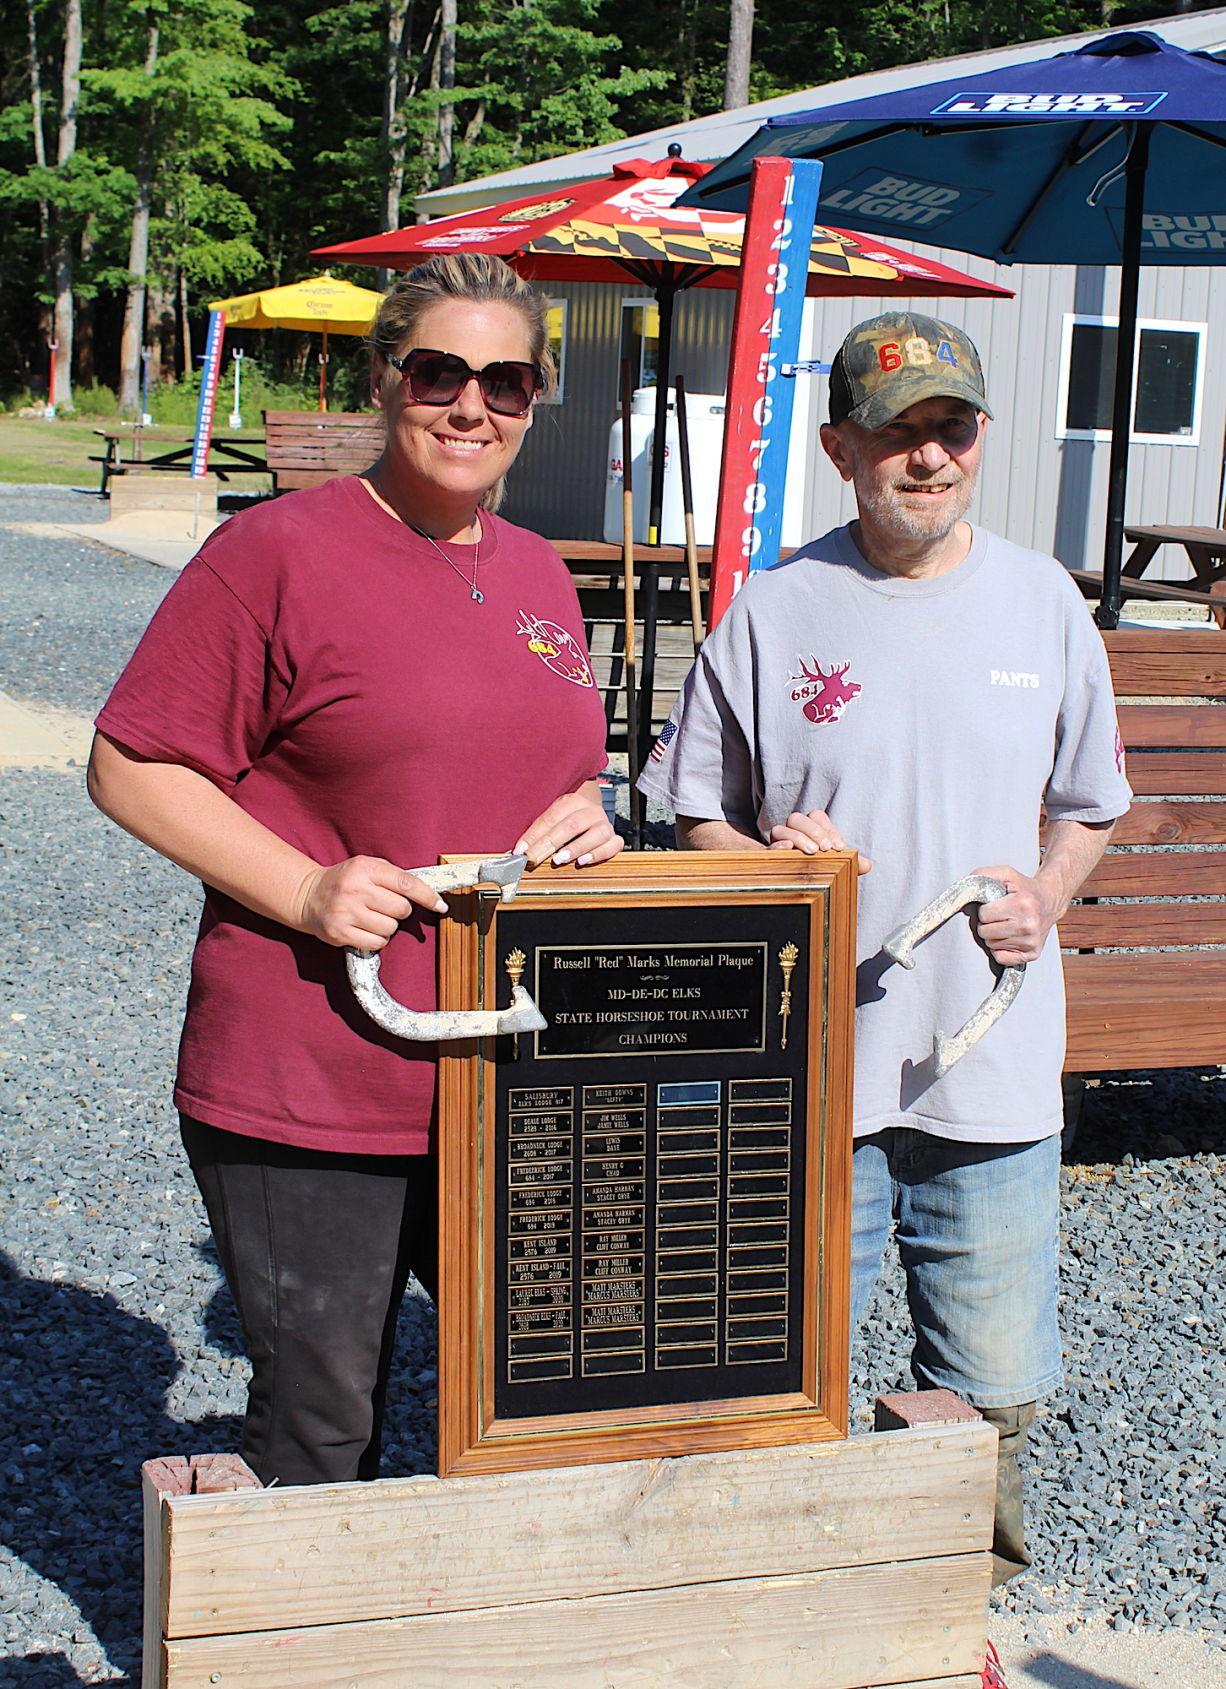 Elks state horseshoe tourney winners '21